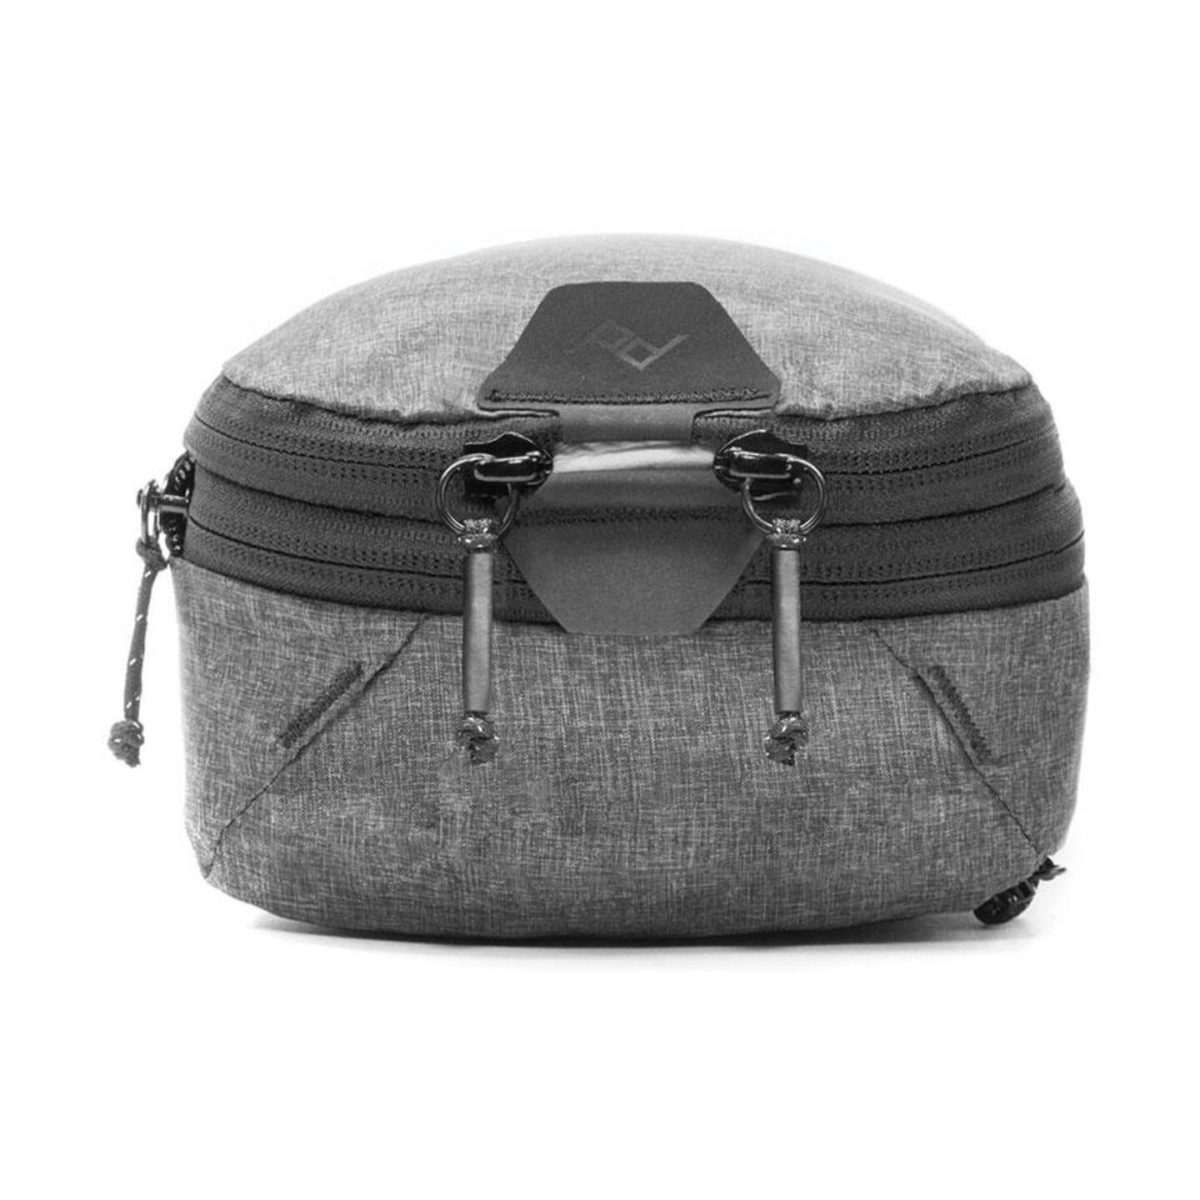 peak_design_packing_cube_small_02